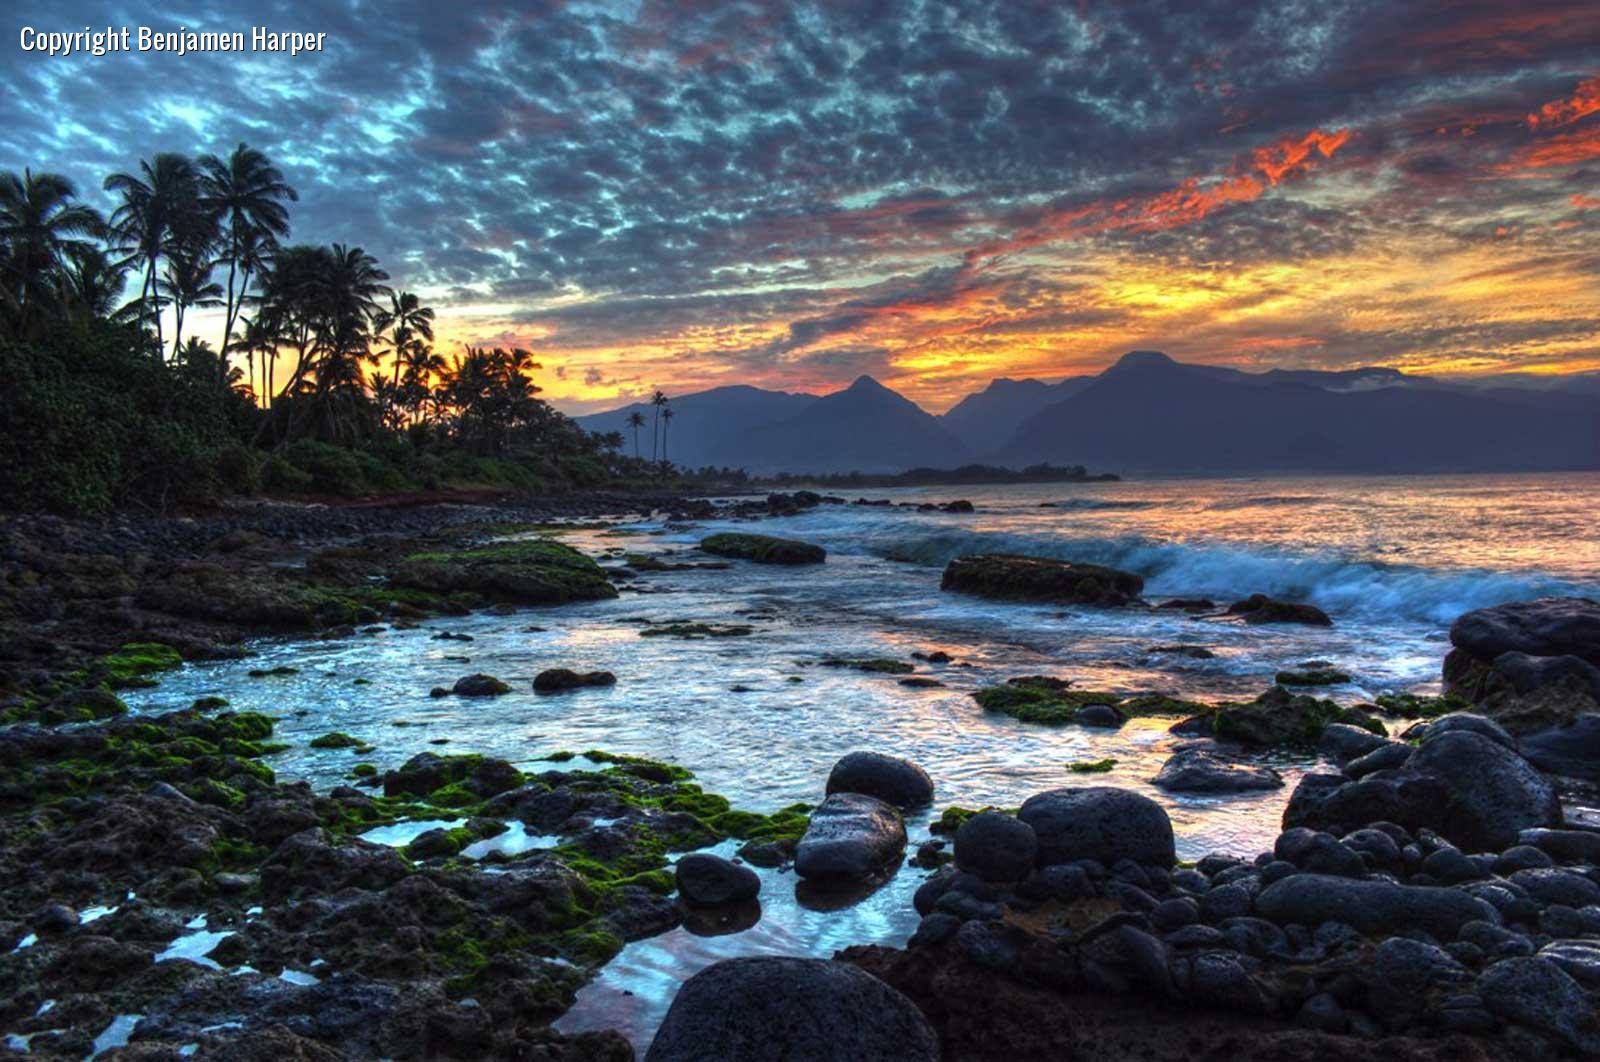 Maui Beach Sunset Wallpaper - WallpaperSafari